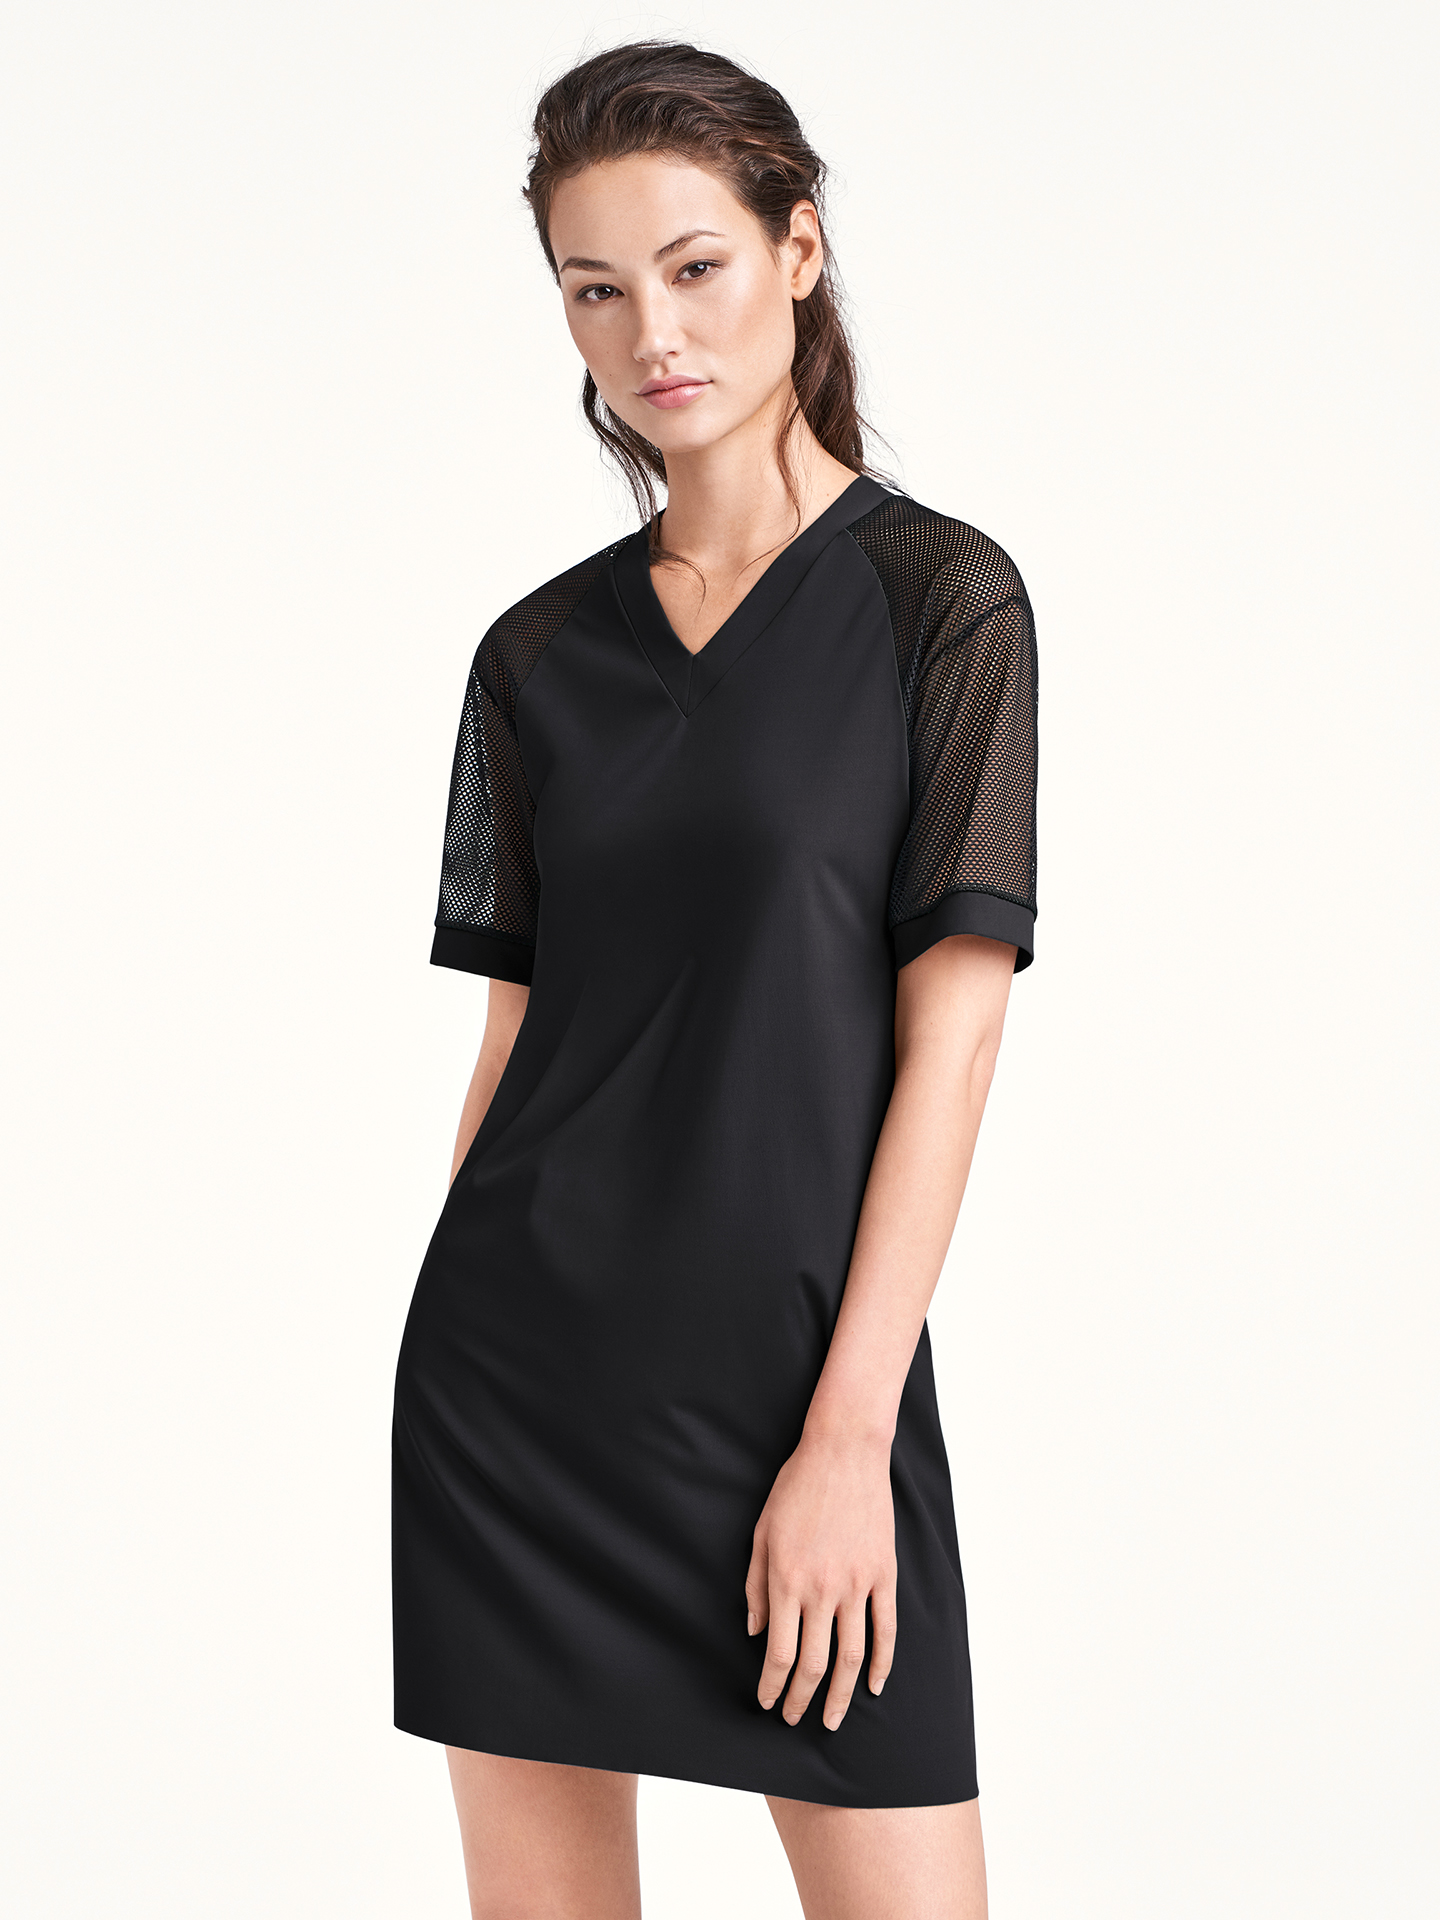 Wolford Apparel & Accessories > Clothing > Abbigliamento Donna Hailey Dress